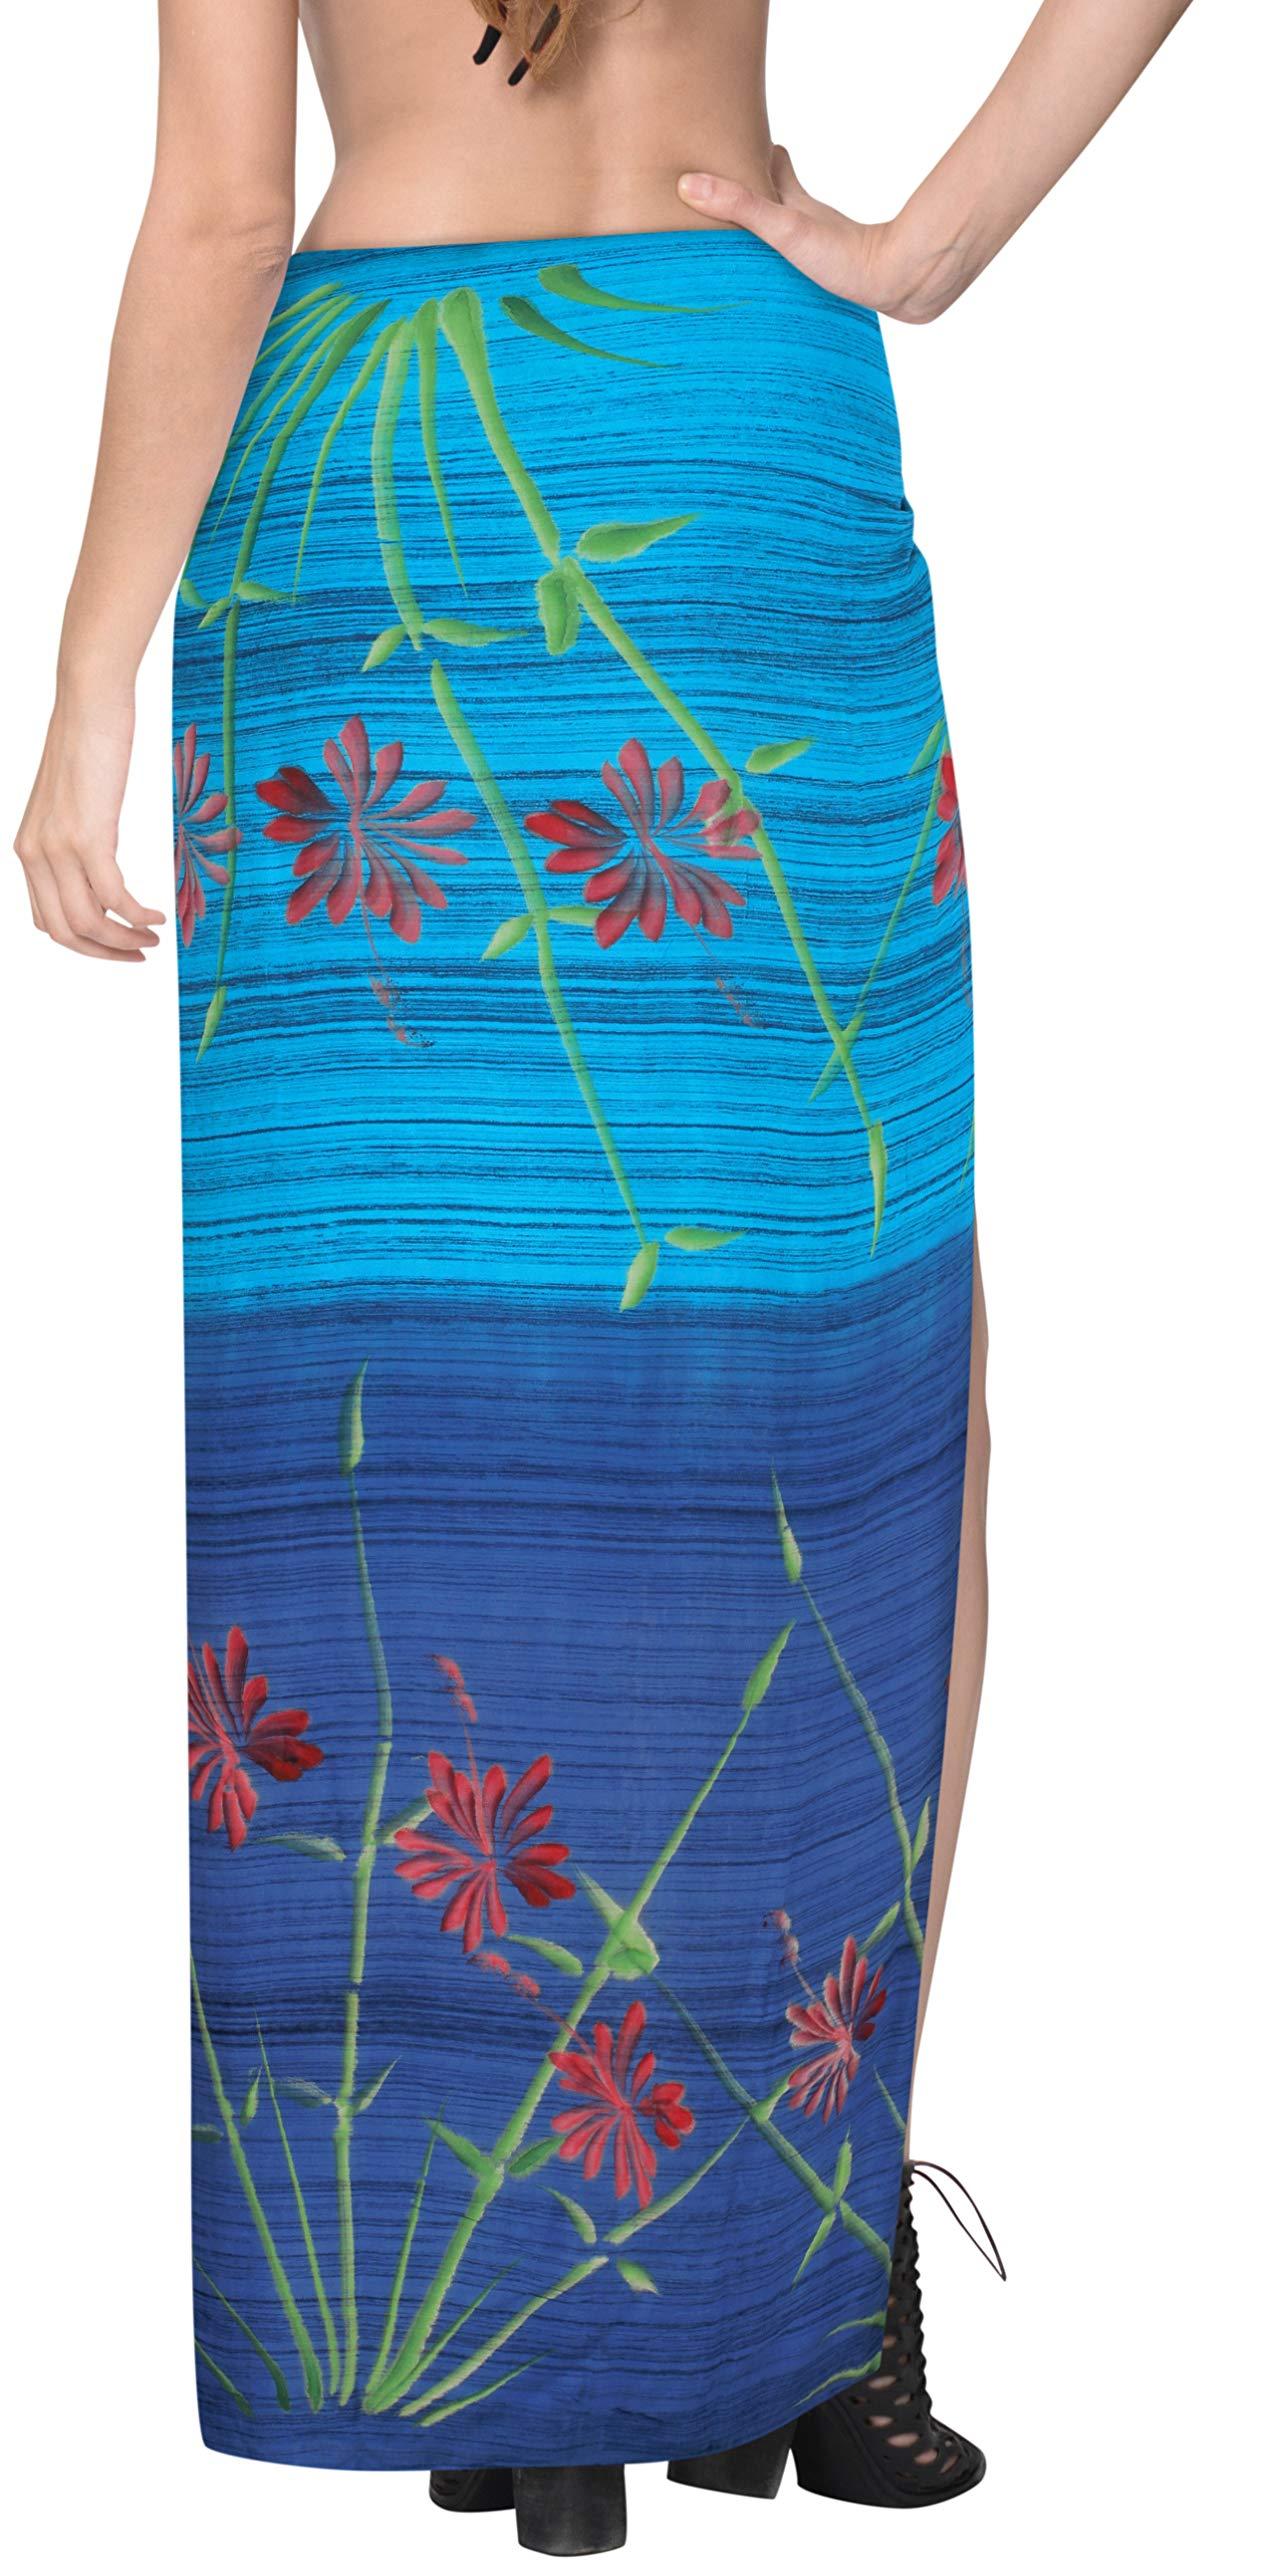 LA LEELA Rayon Coprire Costume da Bagno Avvolgente Sarong Tie Dye Un 3 spesavip